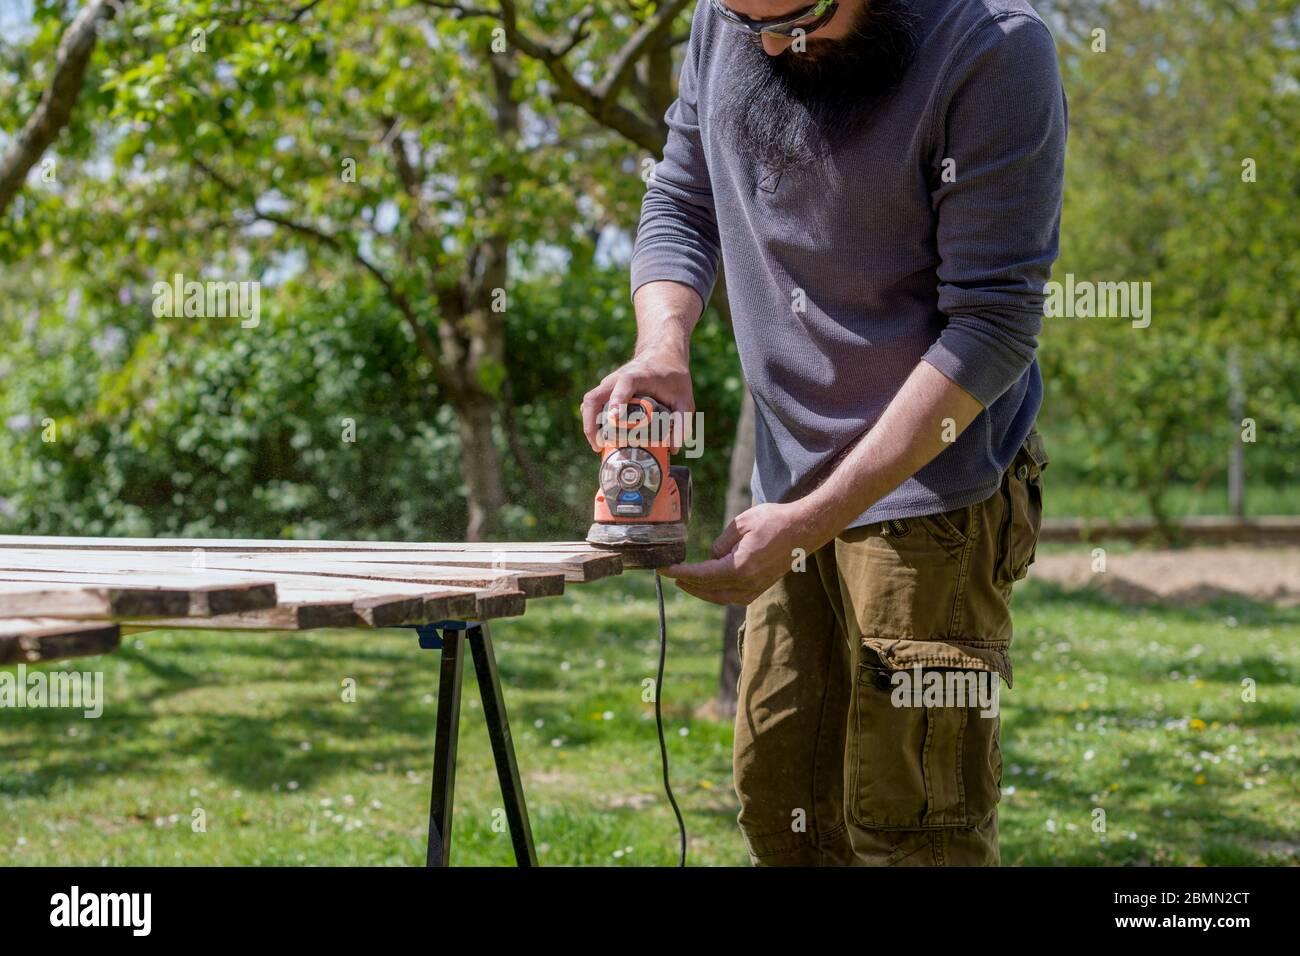 Mid adult caucasian man in the garden sanding wooden planks. DIY home improvement, restoration, carpentry concept. Stock Photo